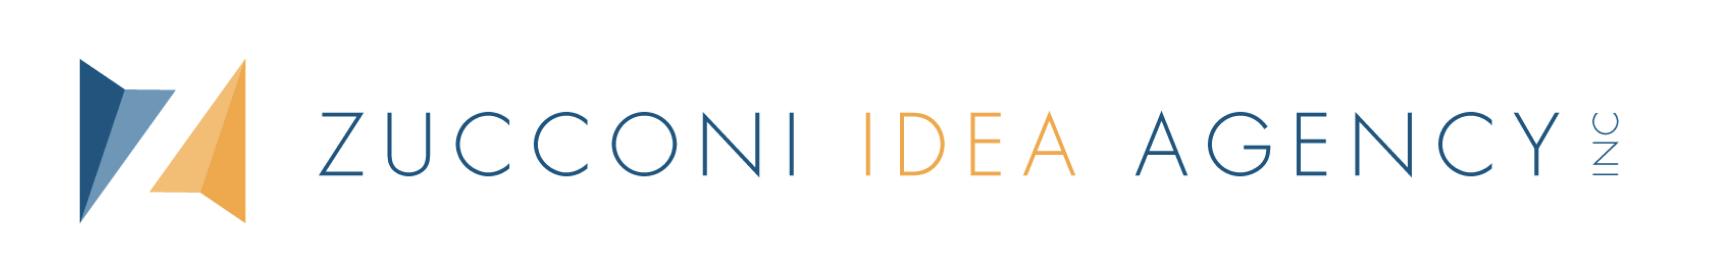 Zucconi Idea Agency